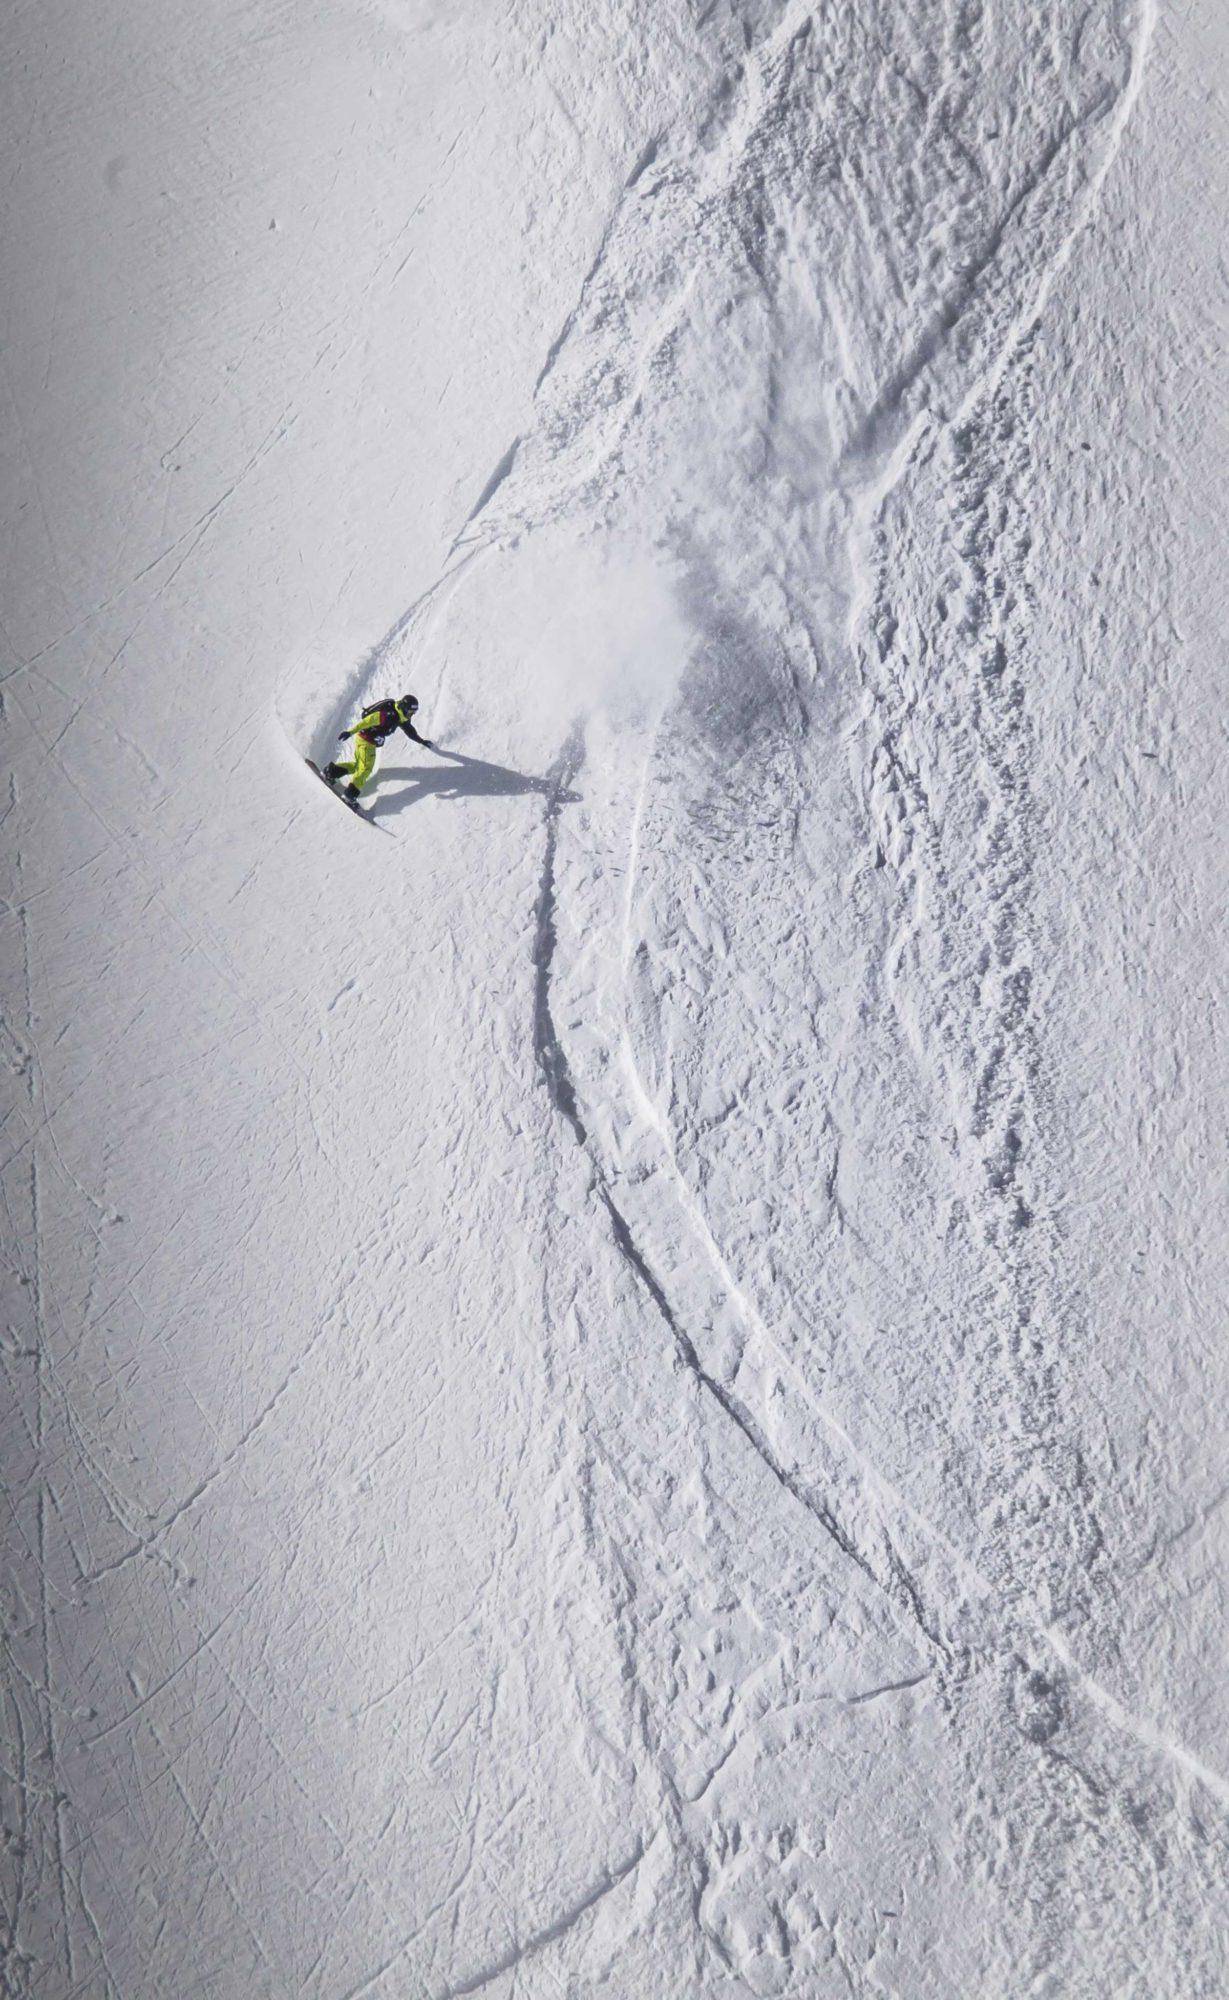 Snowboarder im Tiefschnee - Open Faces Obergurgl-Hochgurgl